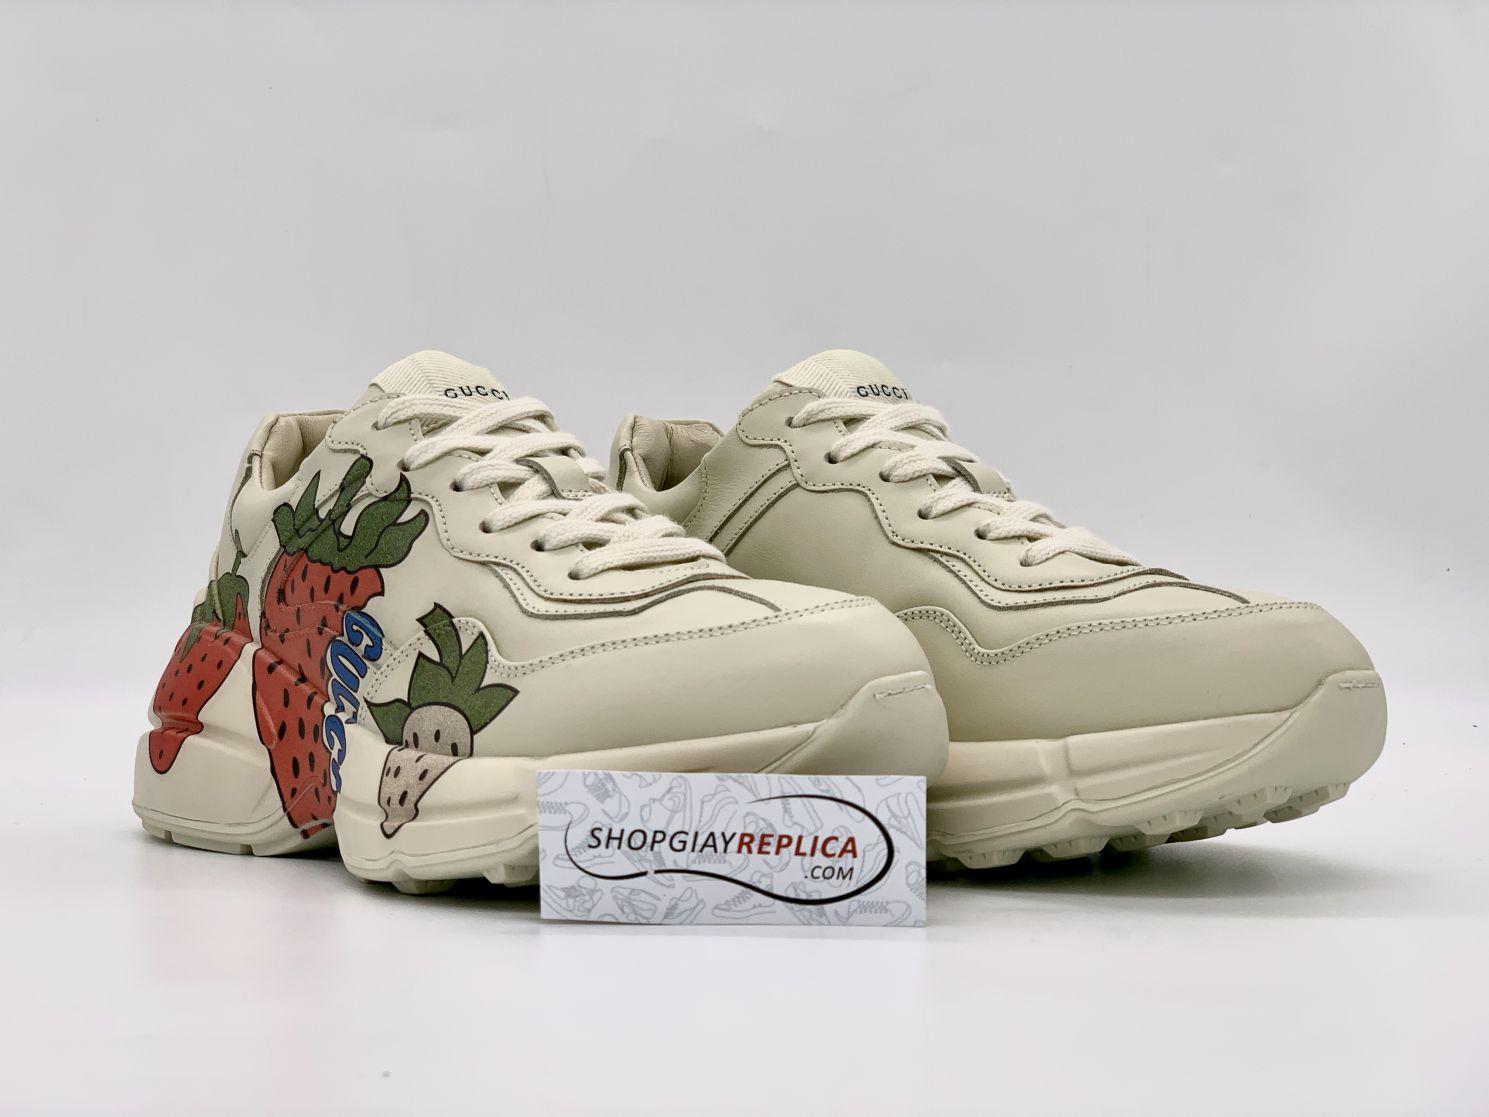 Giày Gucci Rhyton Dâu Tây (Strawberry) Like Auth